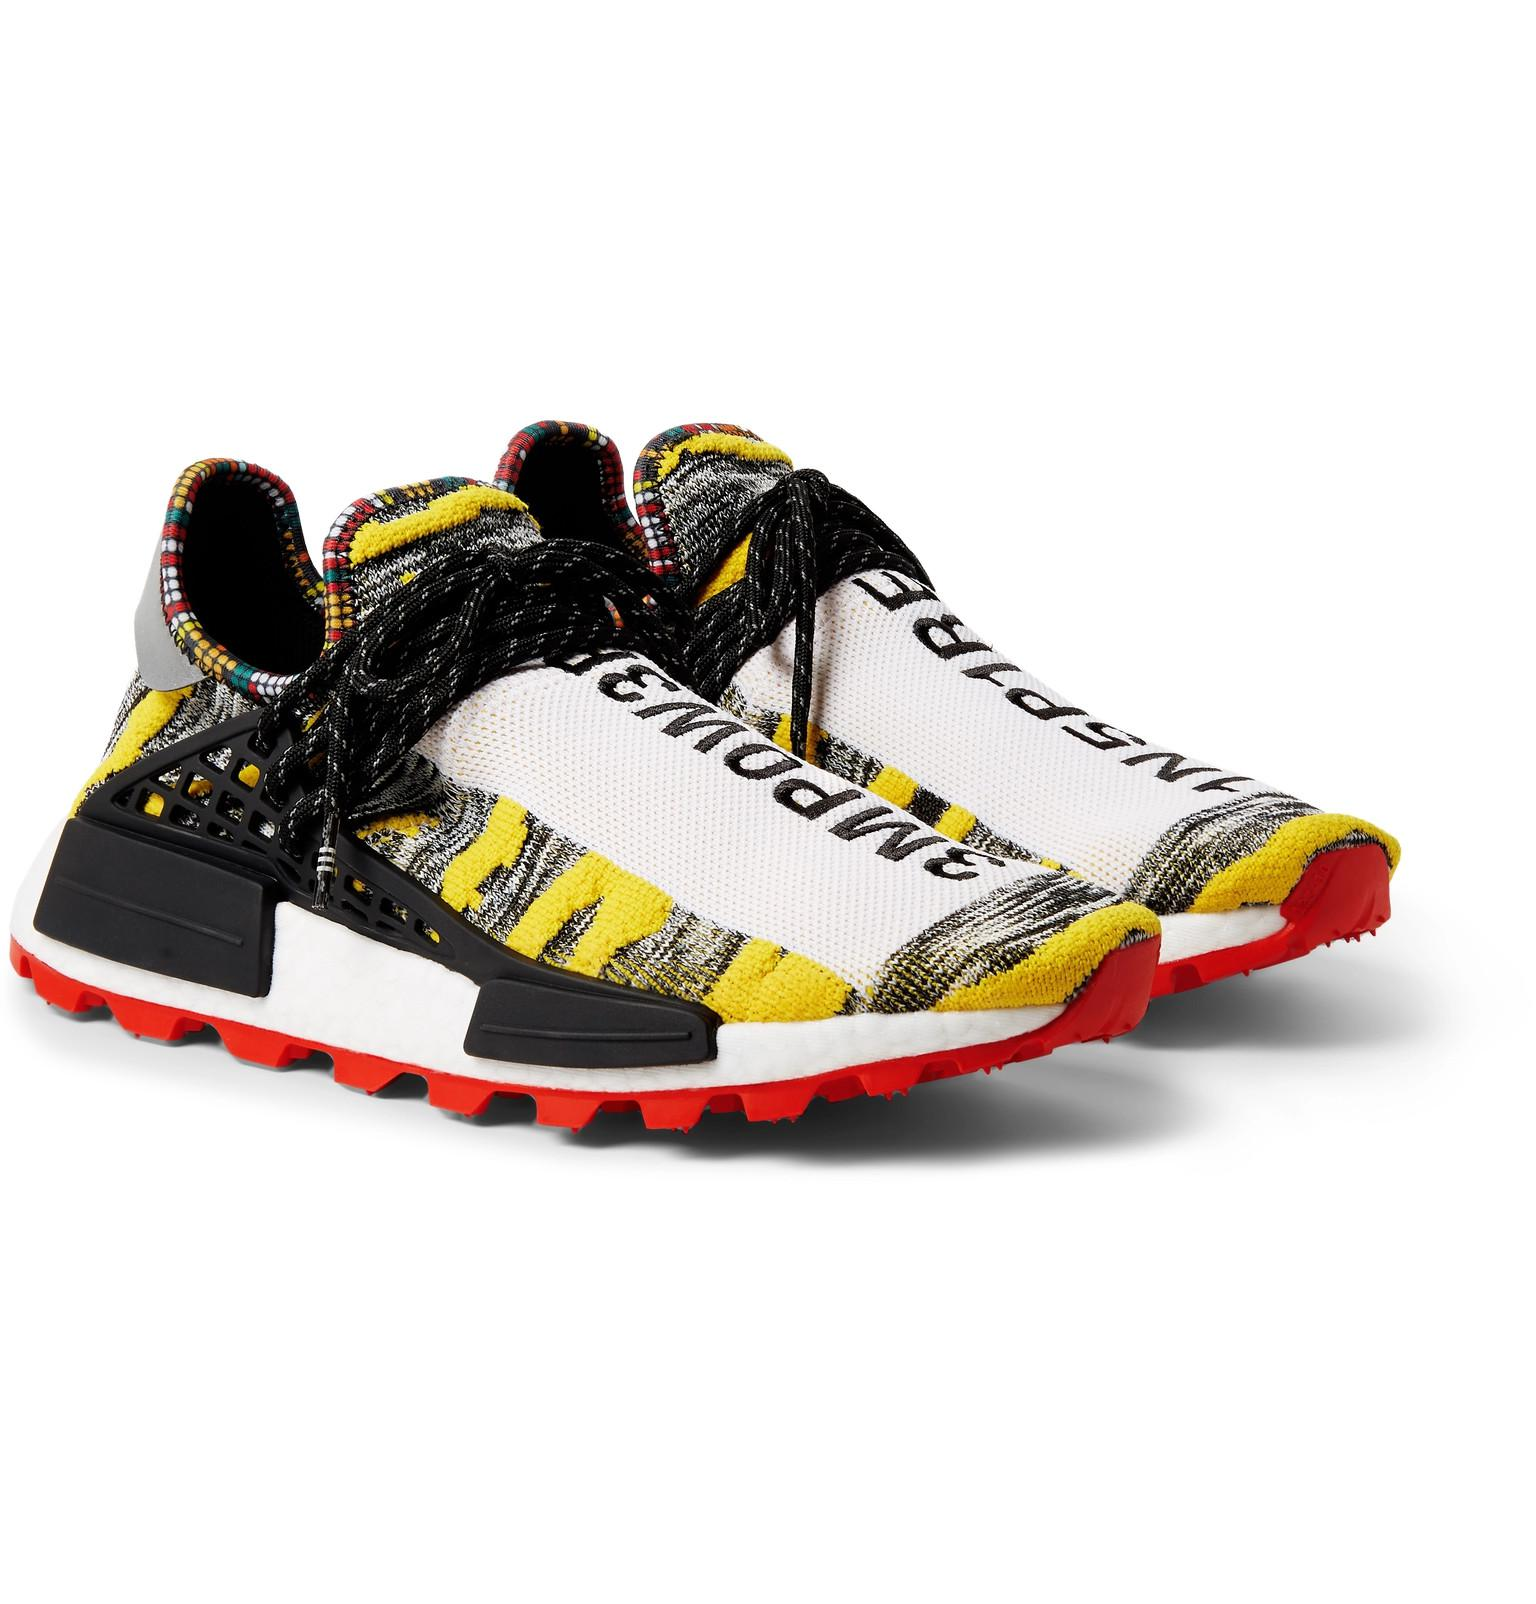 4f49a0921 adidas Originals + Pharrell Williams Solarhu Nmd Primeknit Sneakers ...